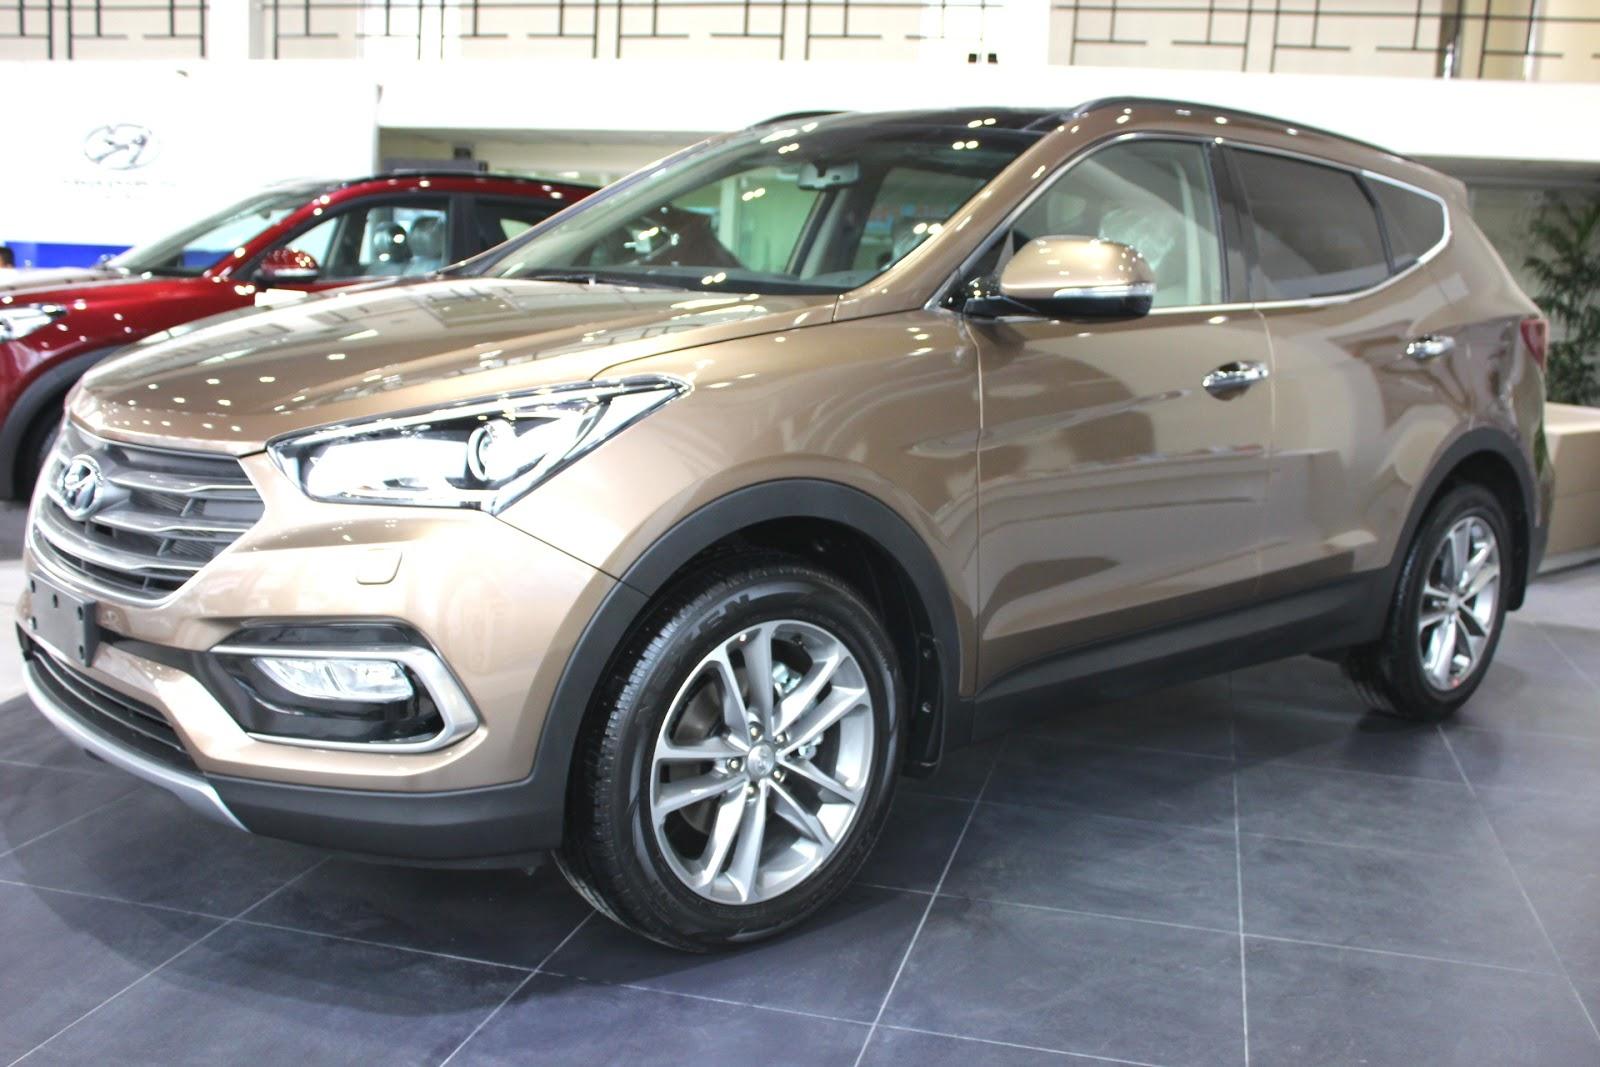 Xe Hyundai Santafe New Model màu nâu 04